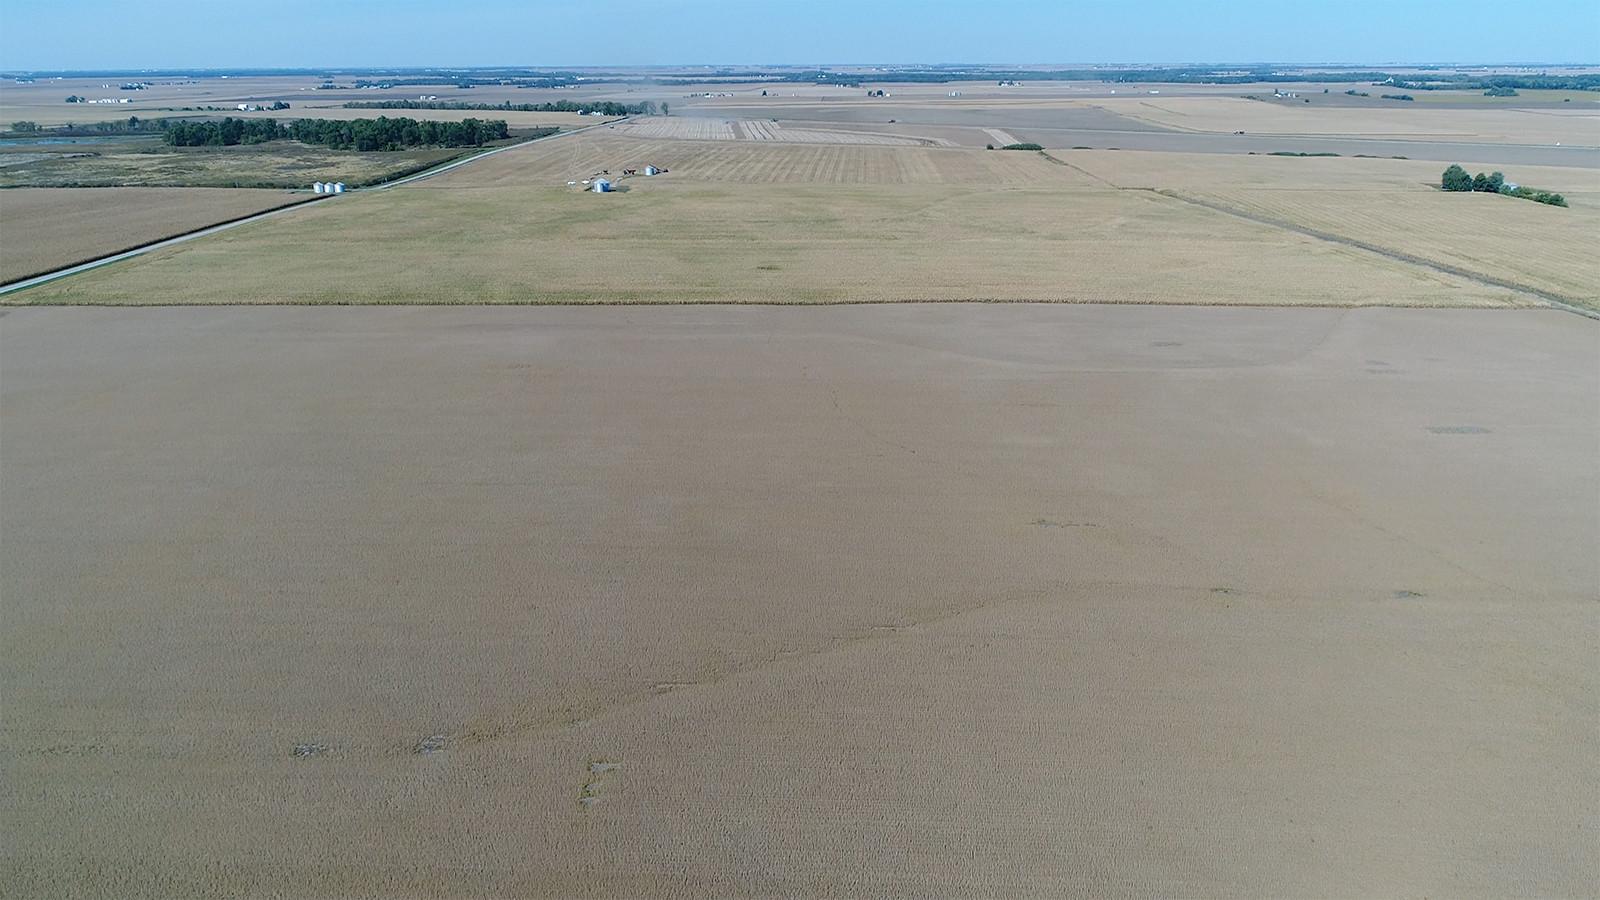 Drone Pic 1 - MWA Auctions & Real Estate | Douglas Co Farmland Auction 196 Ac - Dec 4 2019